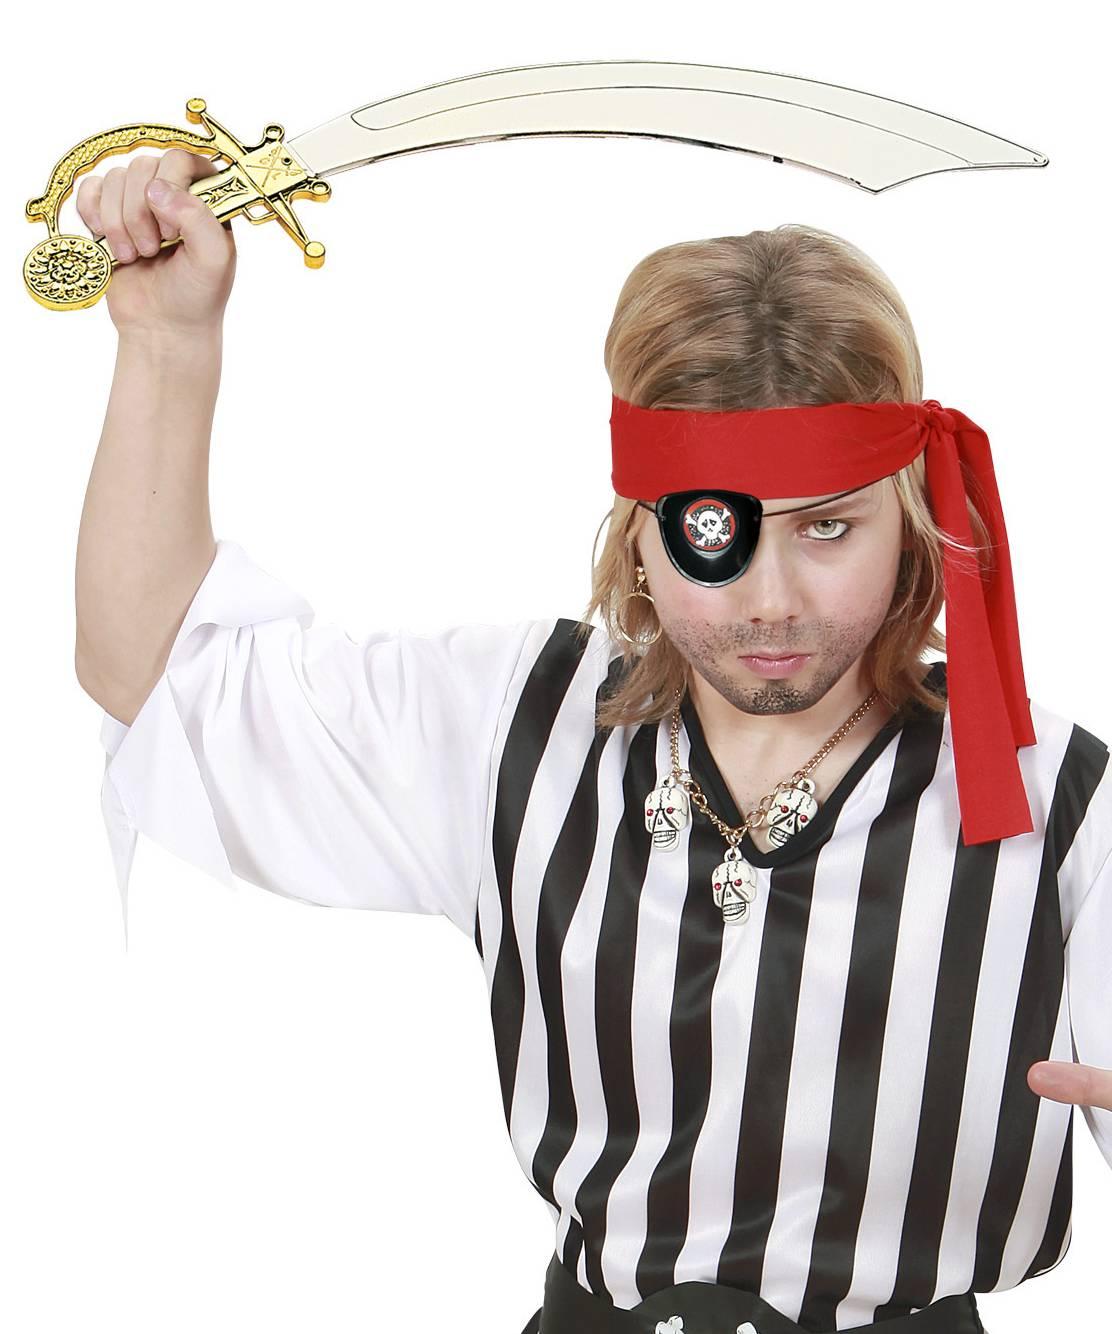 Sabre-de-pirate-2